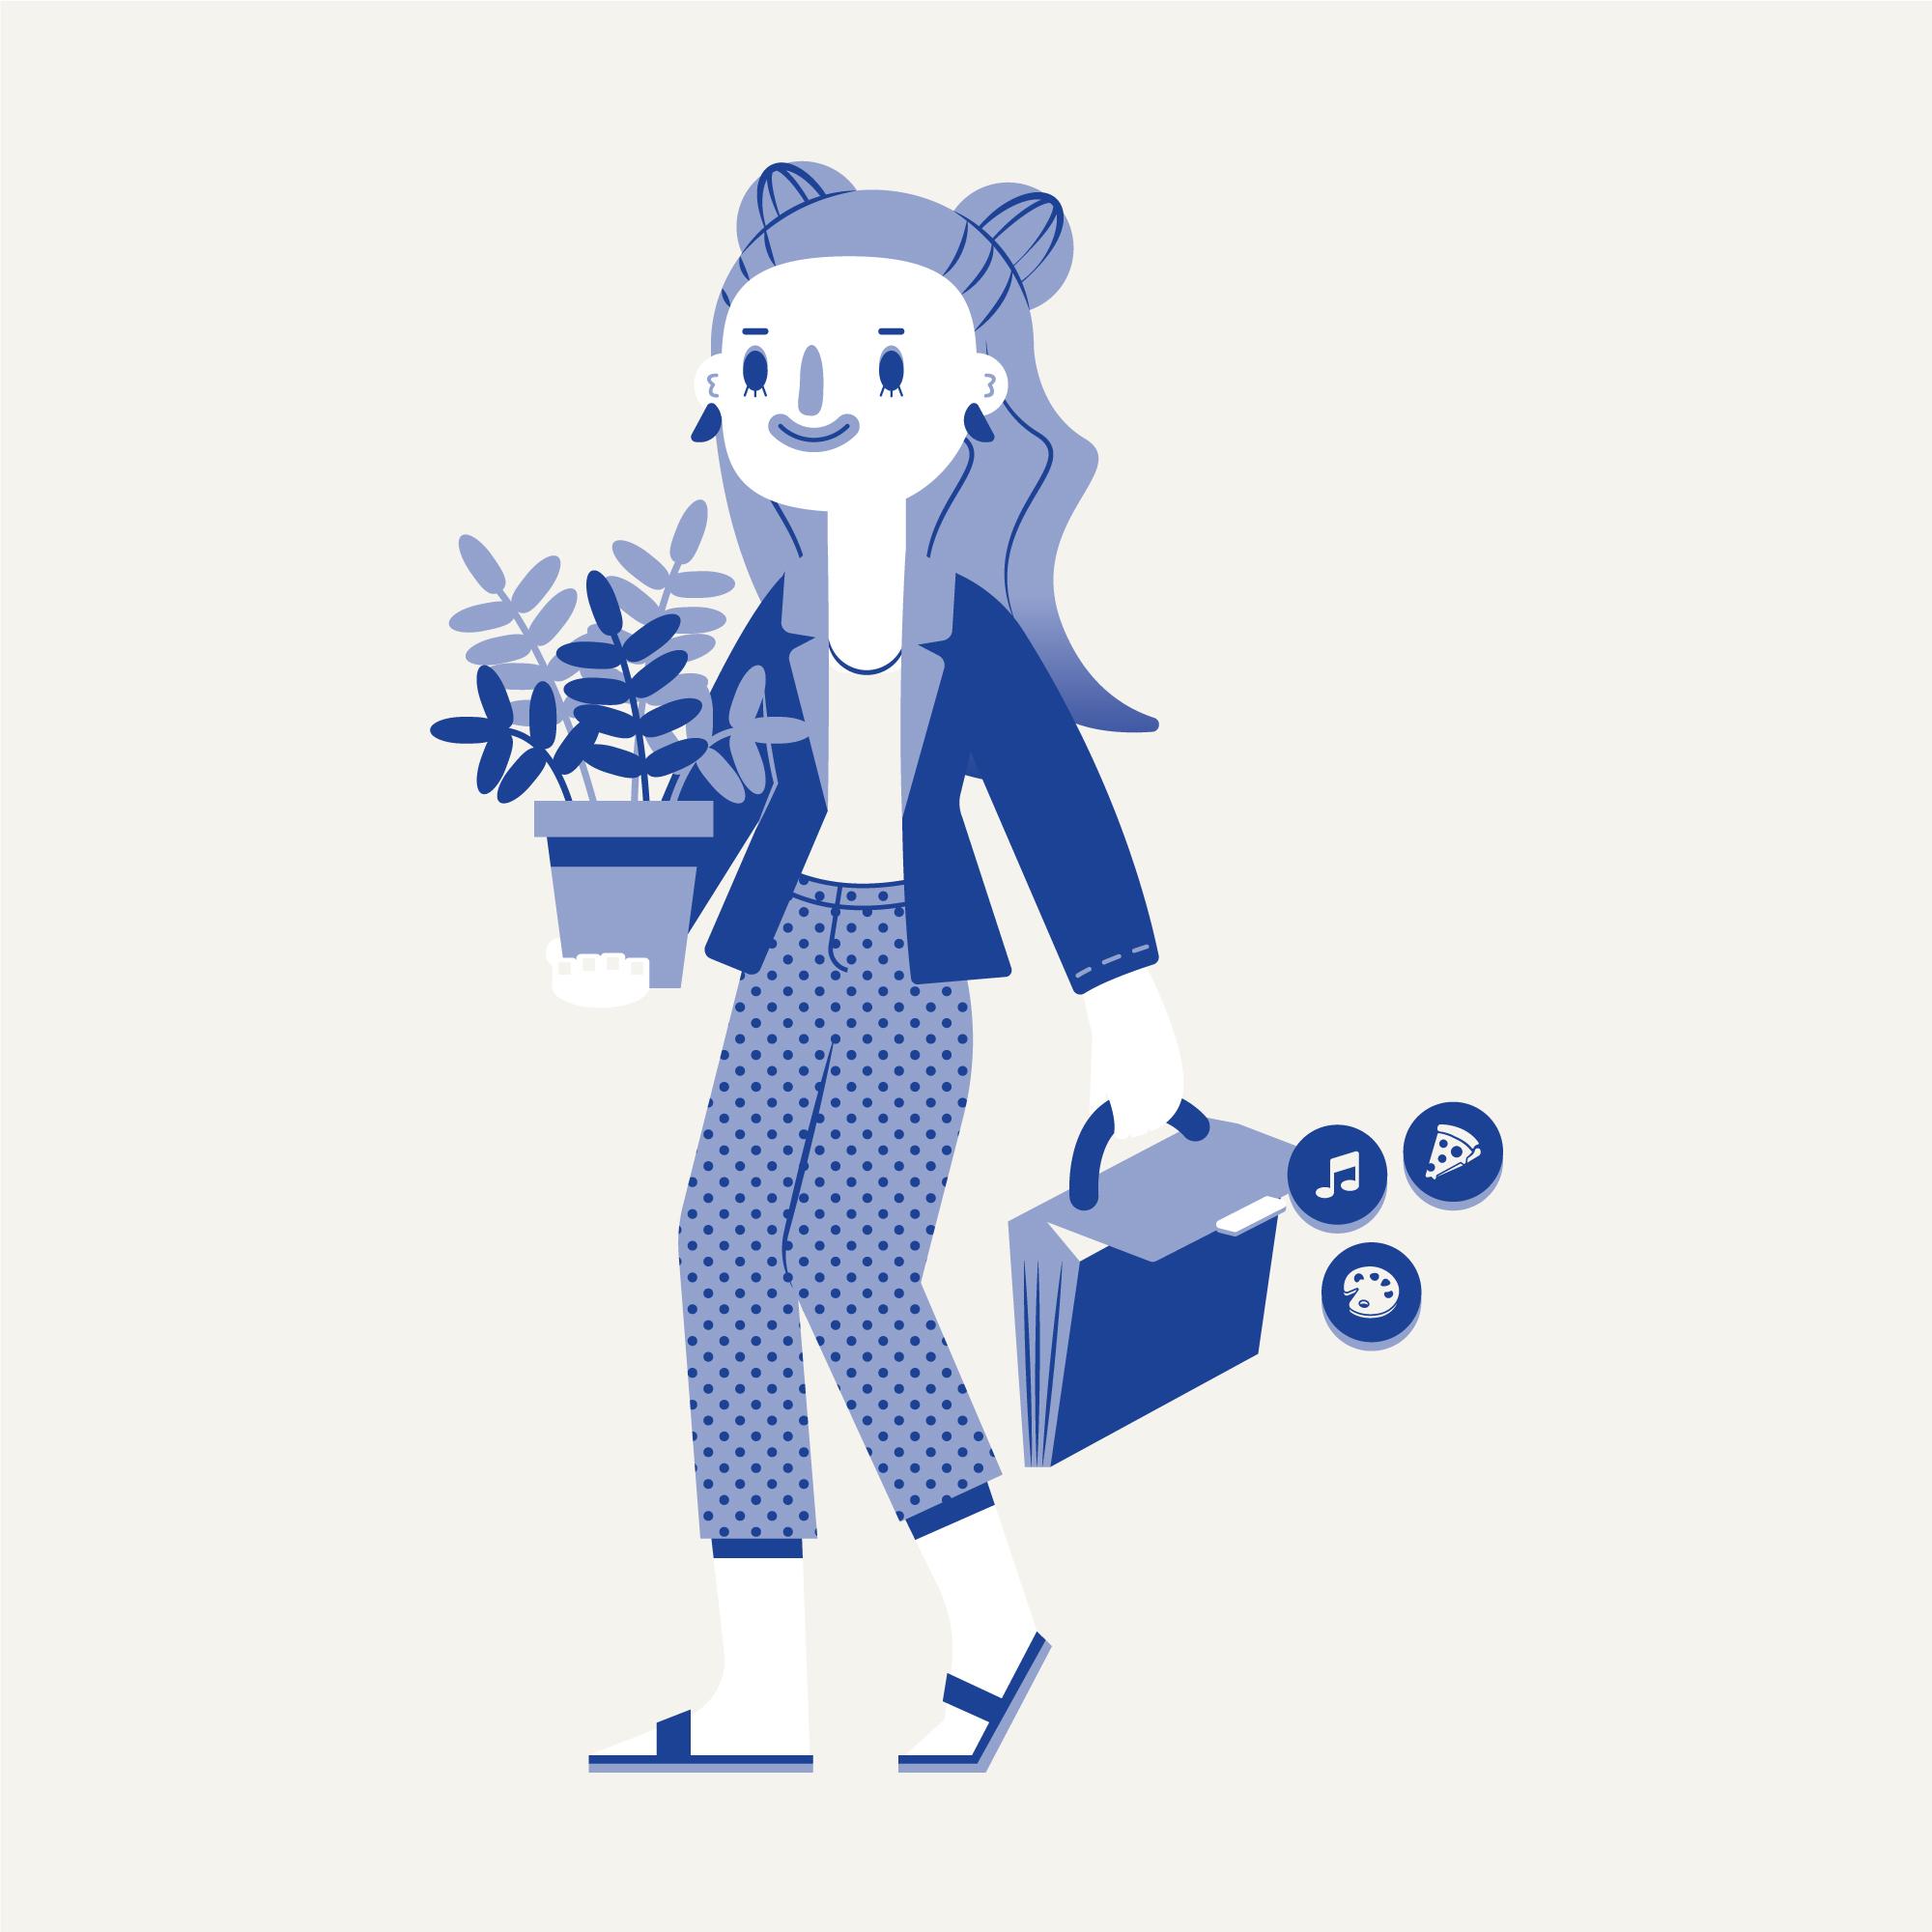 Manual-of-Me---Illustration-1---Social---0118.jpg